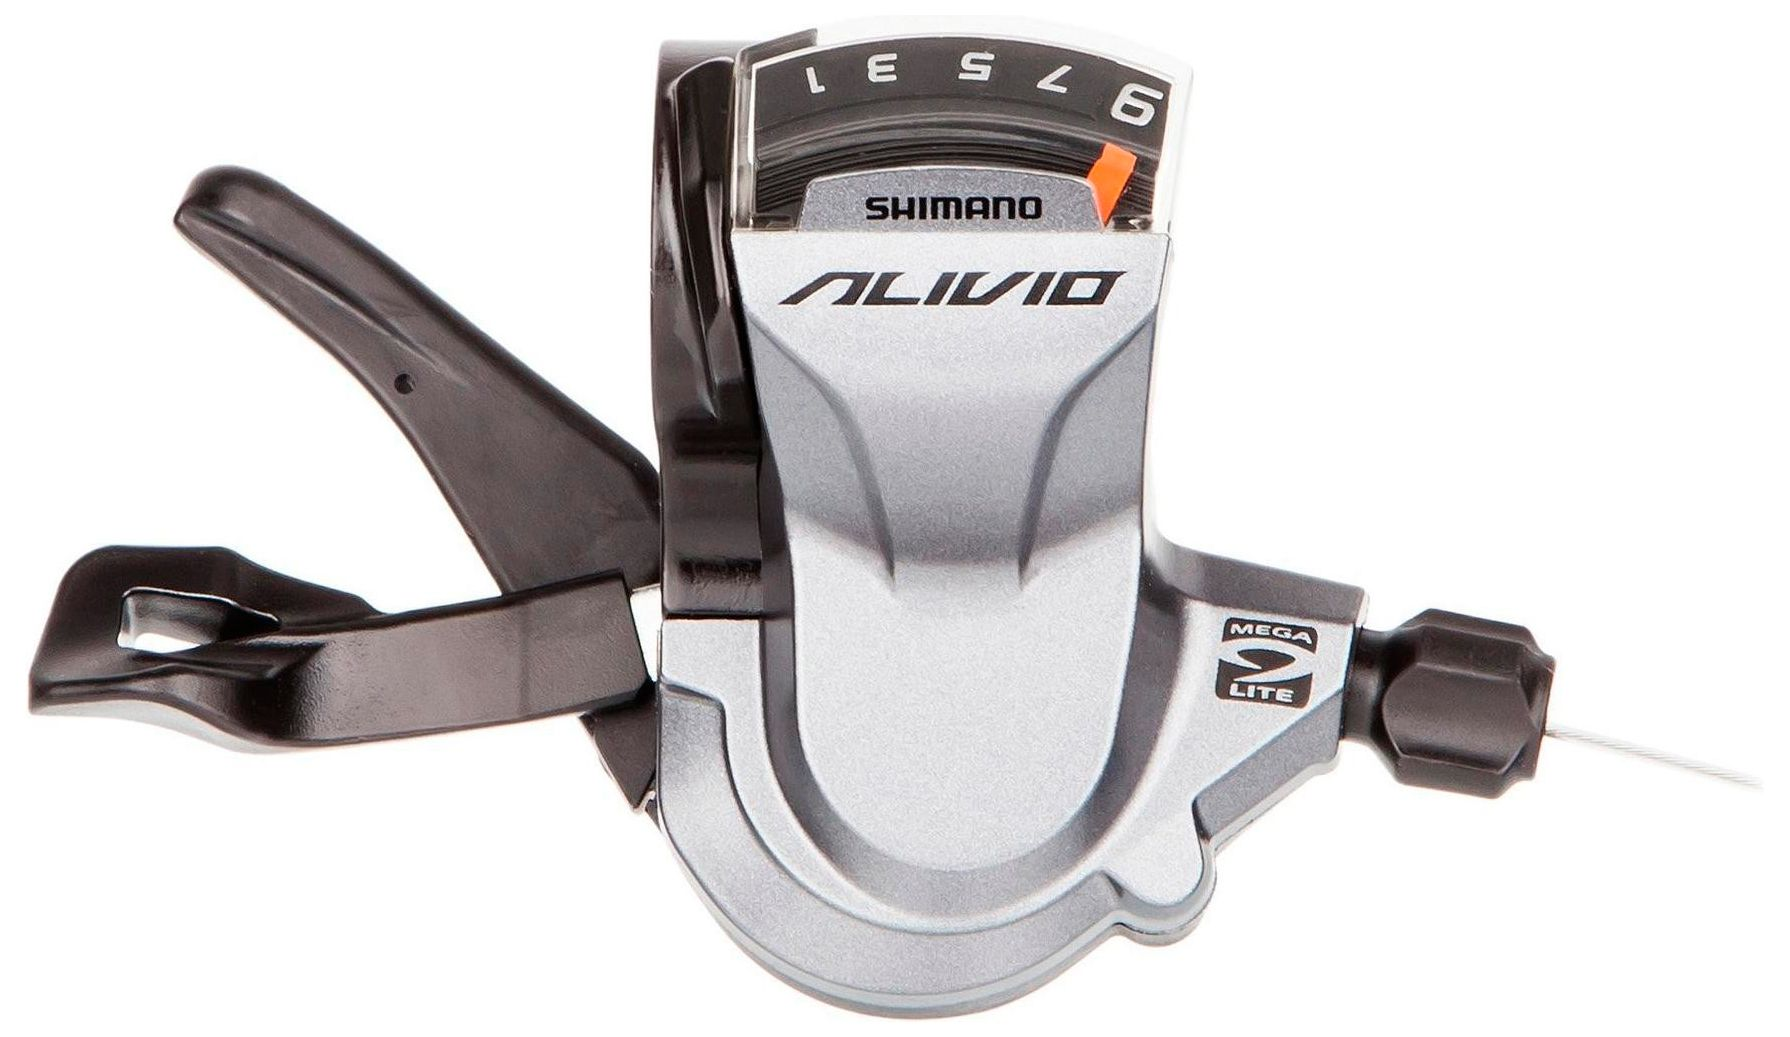 Запчасть Shimano Alivio M4000, прав, 9ск, тр. 2050 мм шифтер shimano alivio m4000 3 x 9 скоростей